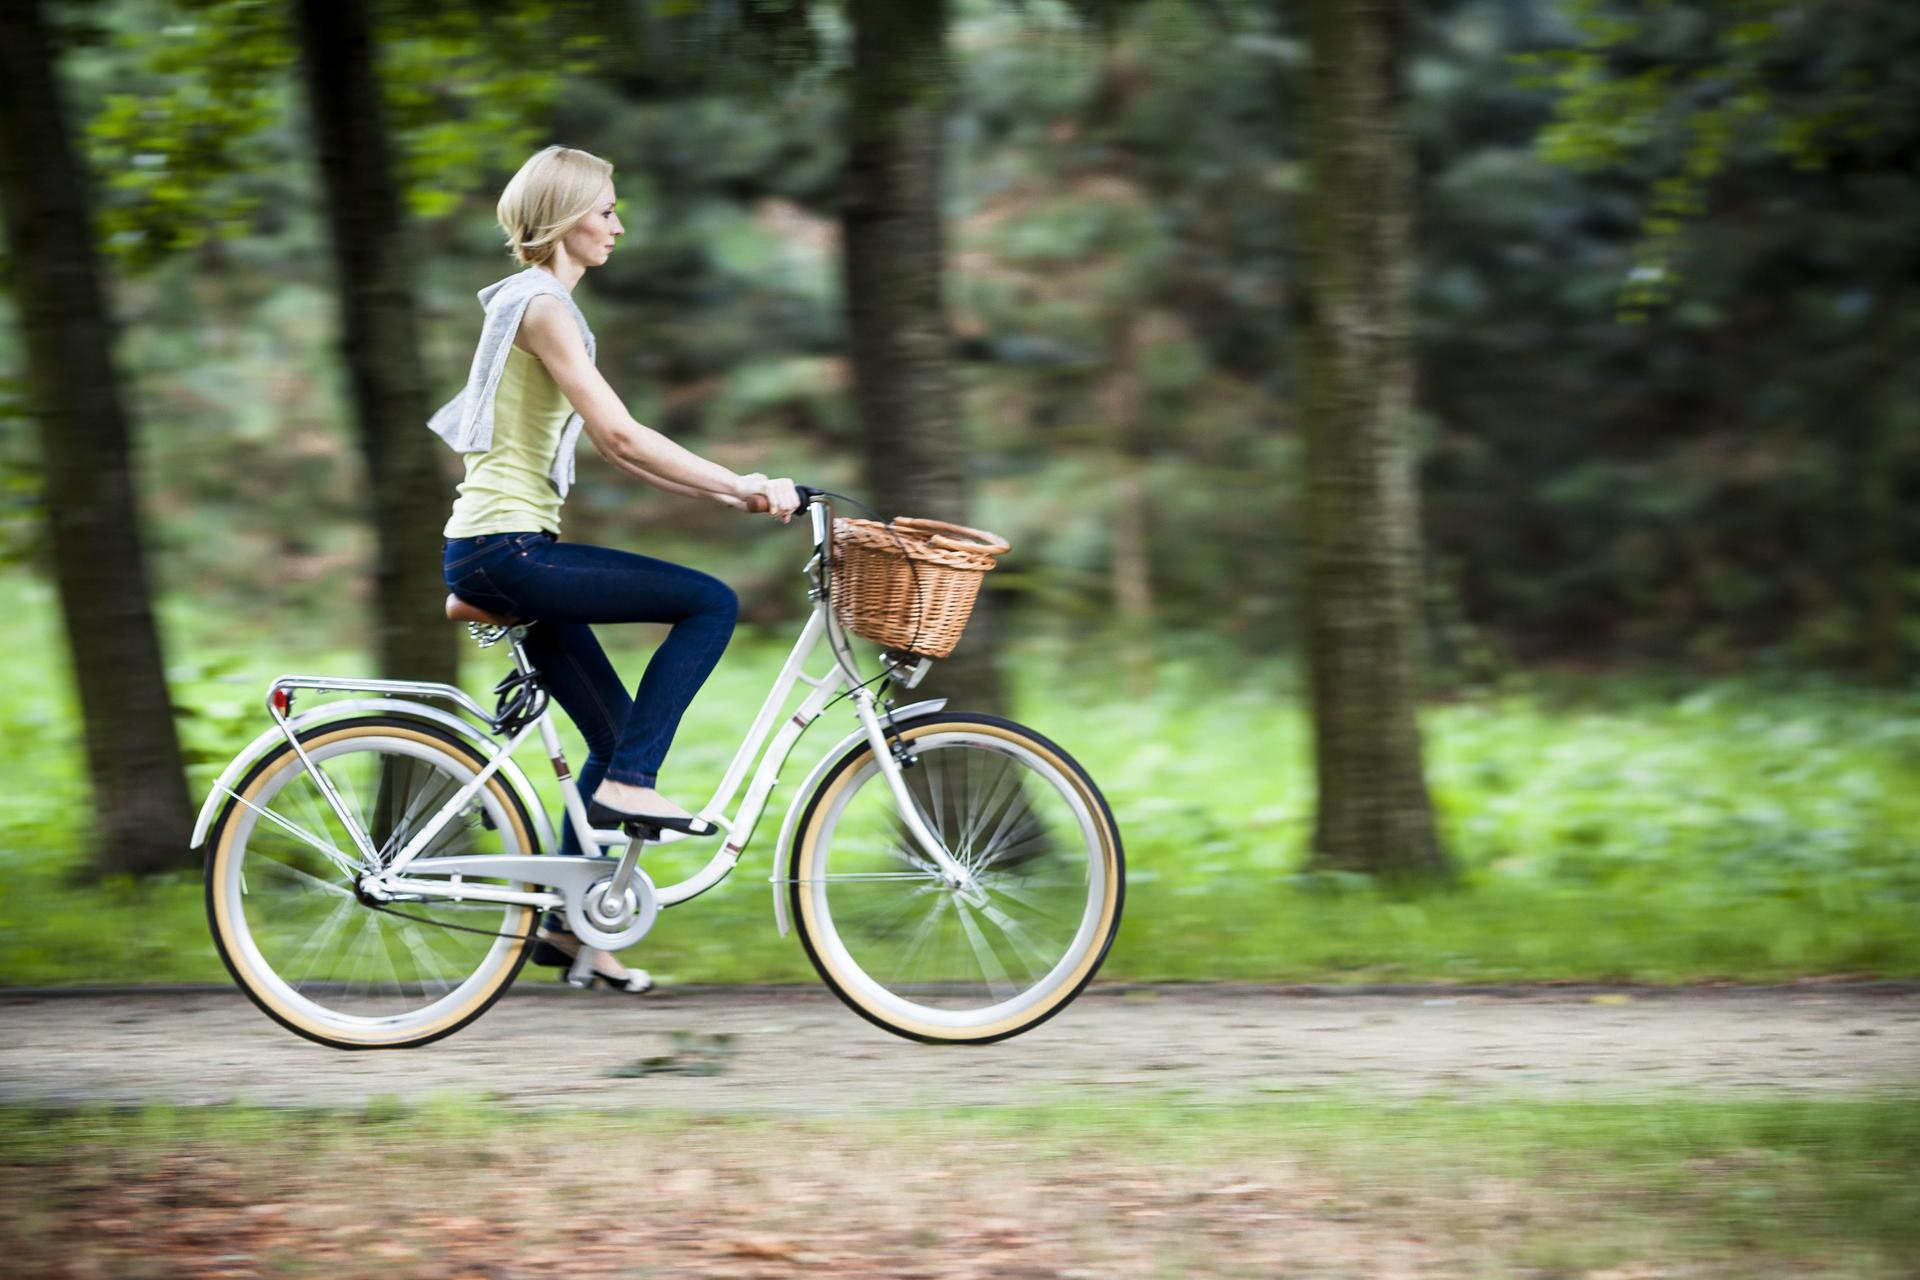 Jak schudnąć na rowerze? - sunela.eu